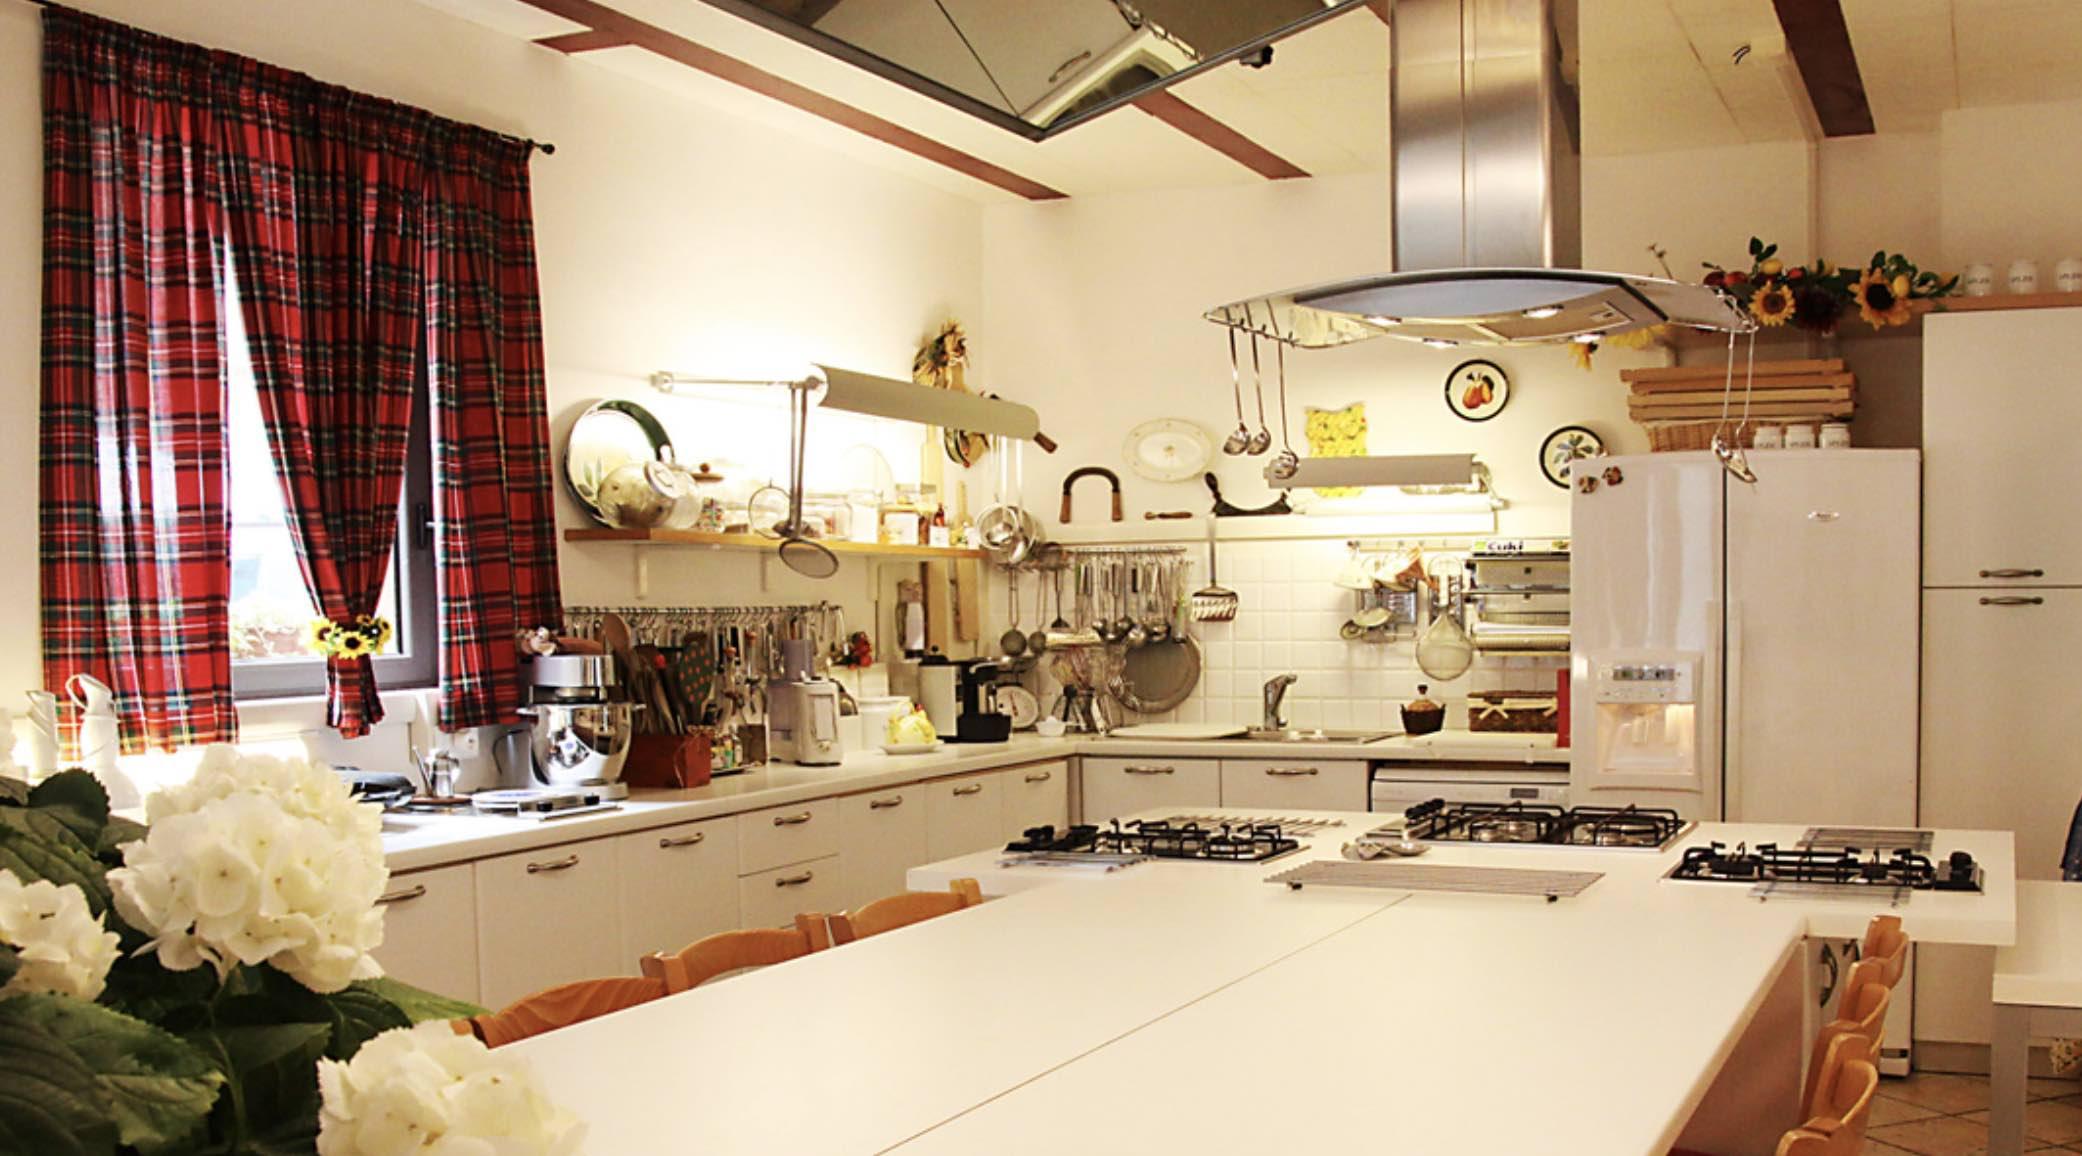 Tuscan cooking school kitchen